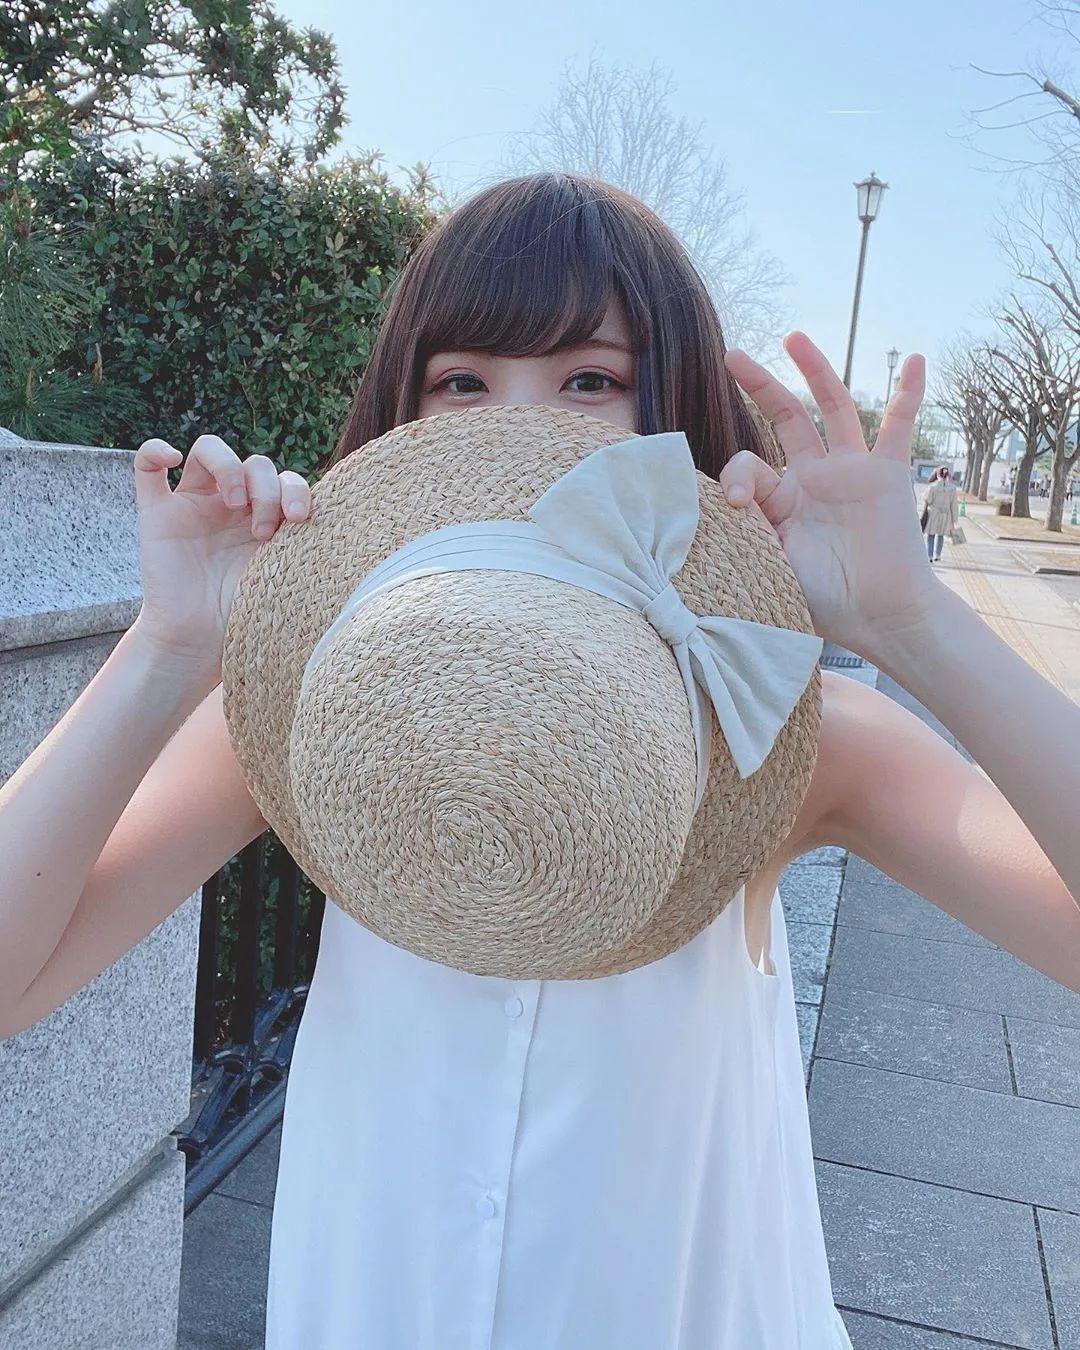 日本第一coser(Enako) Instagram:enakorin日常照及coser照_图片 No.1